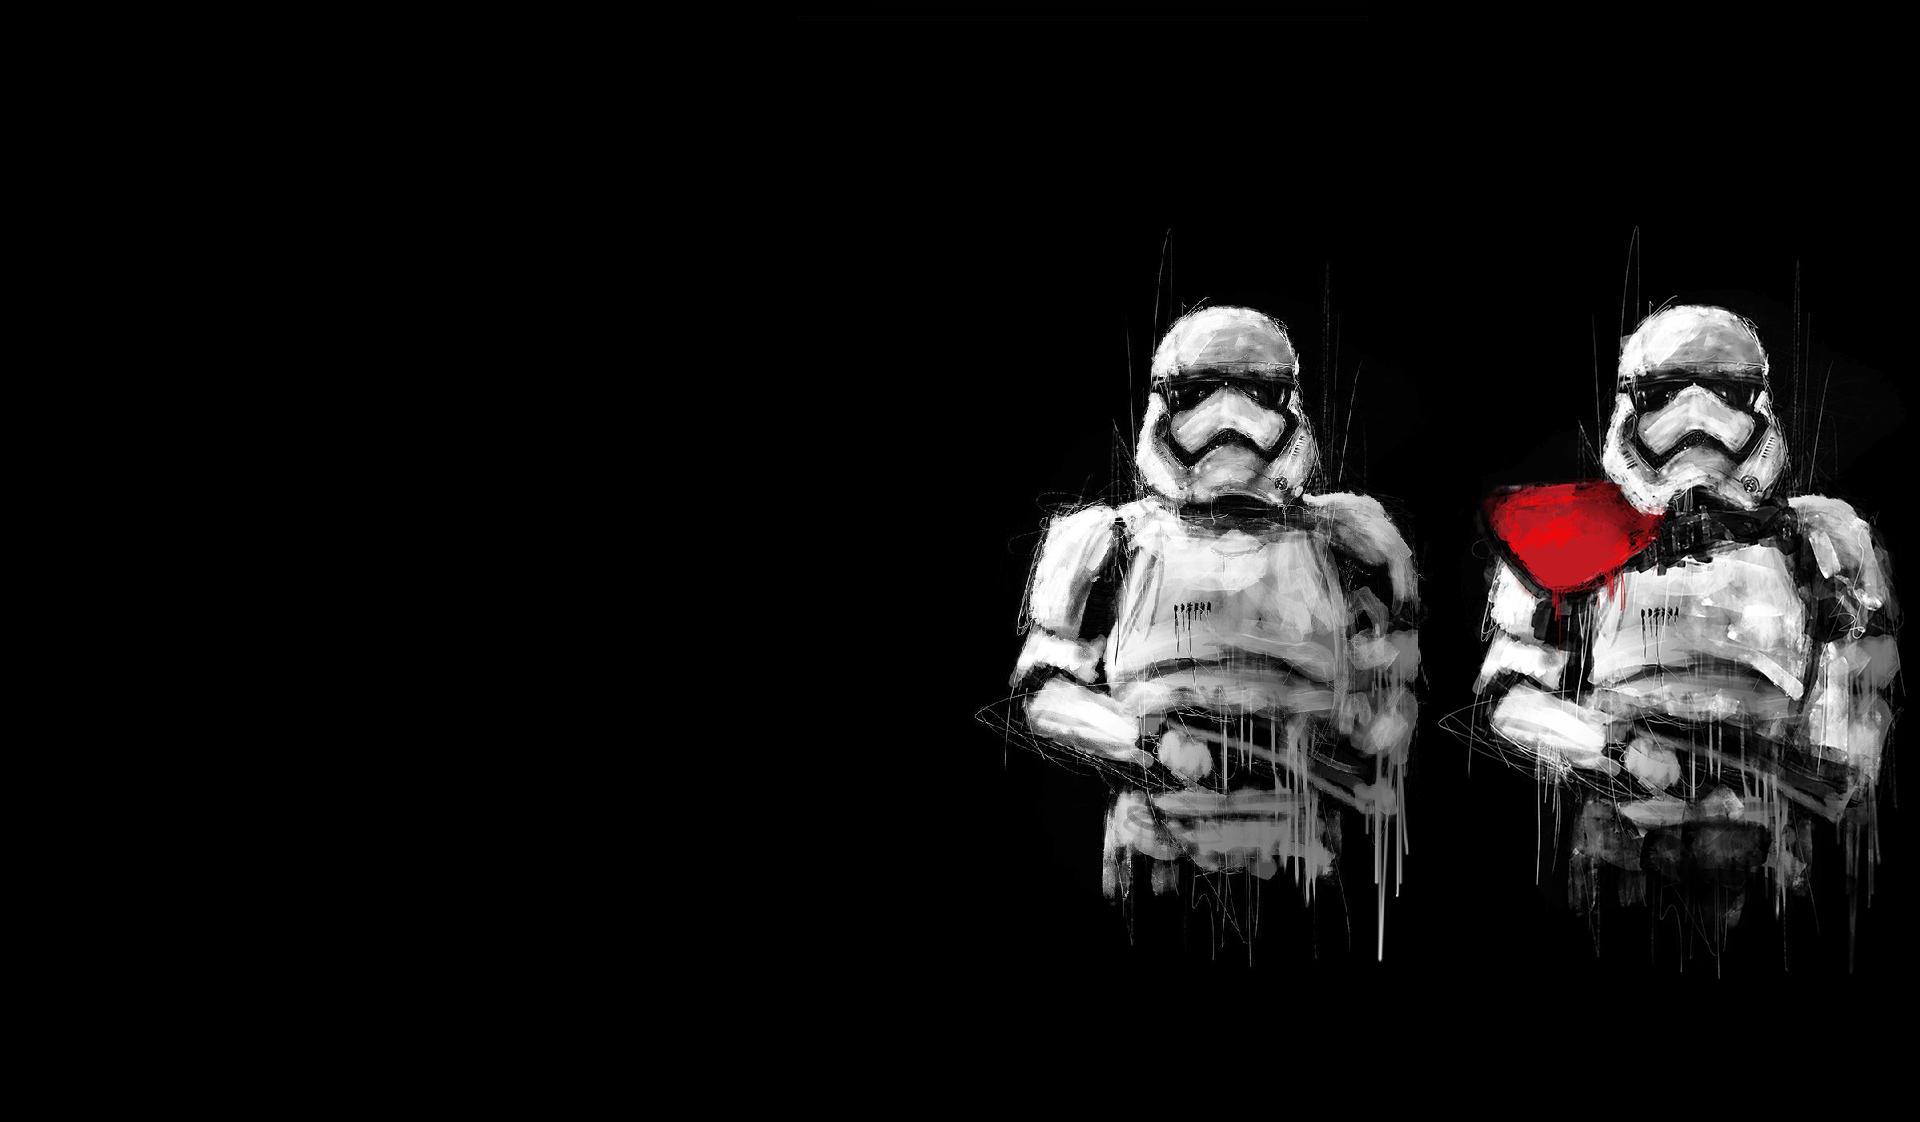 Stormtrooper Wallpaper HD | PixelsTalk.Net